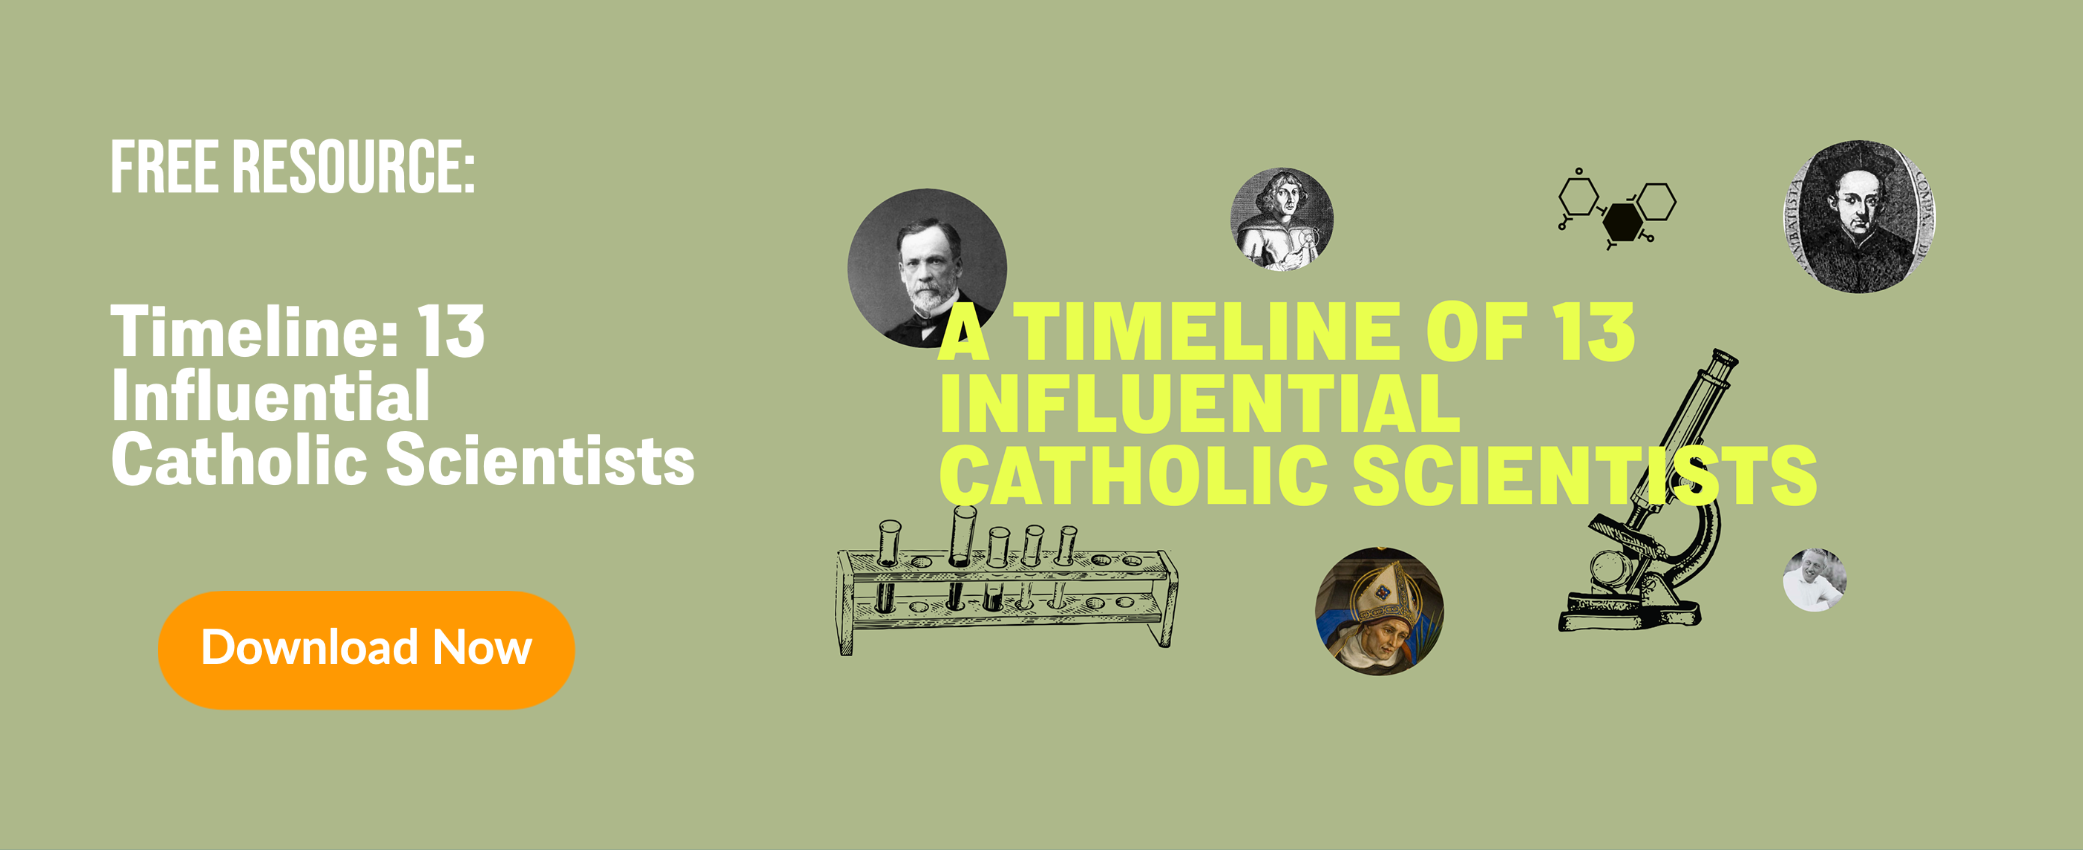 Timeline of Catholic Scientist